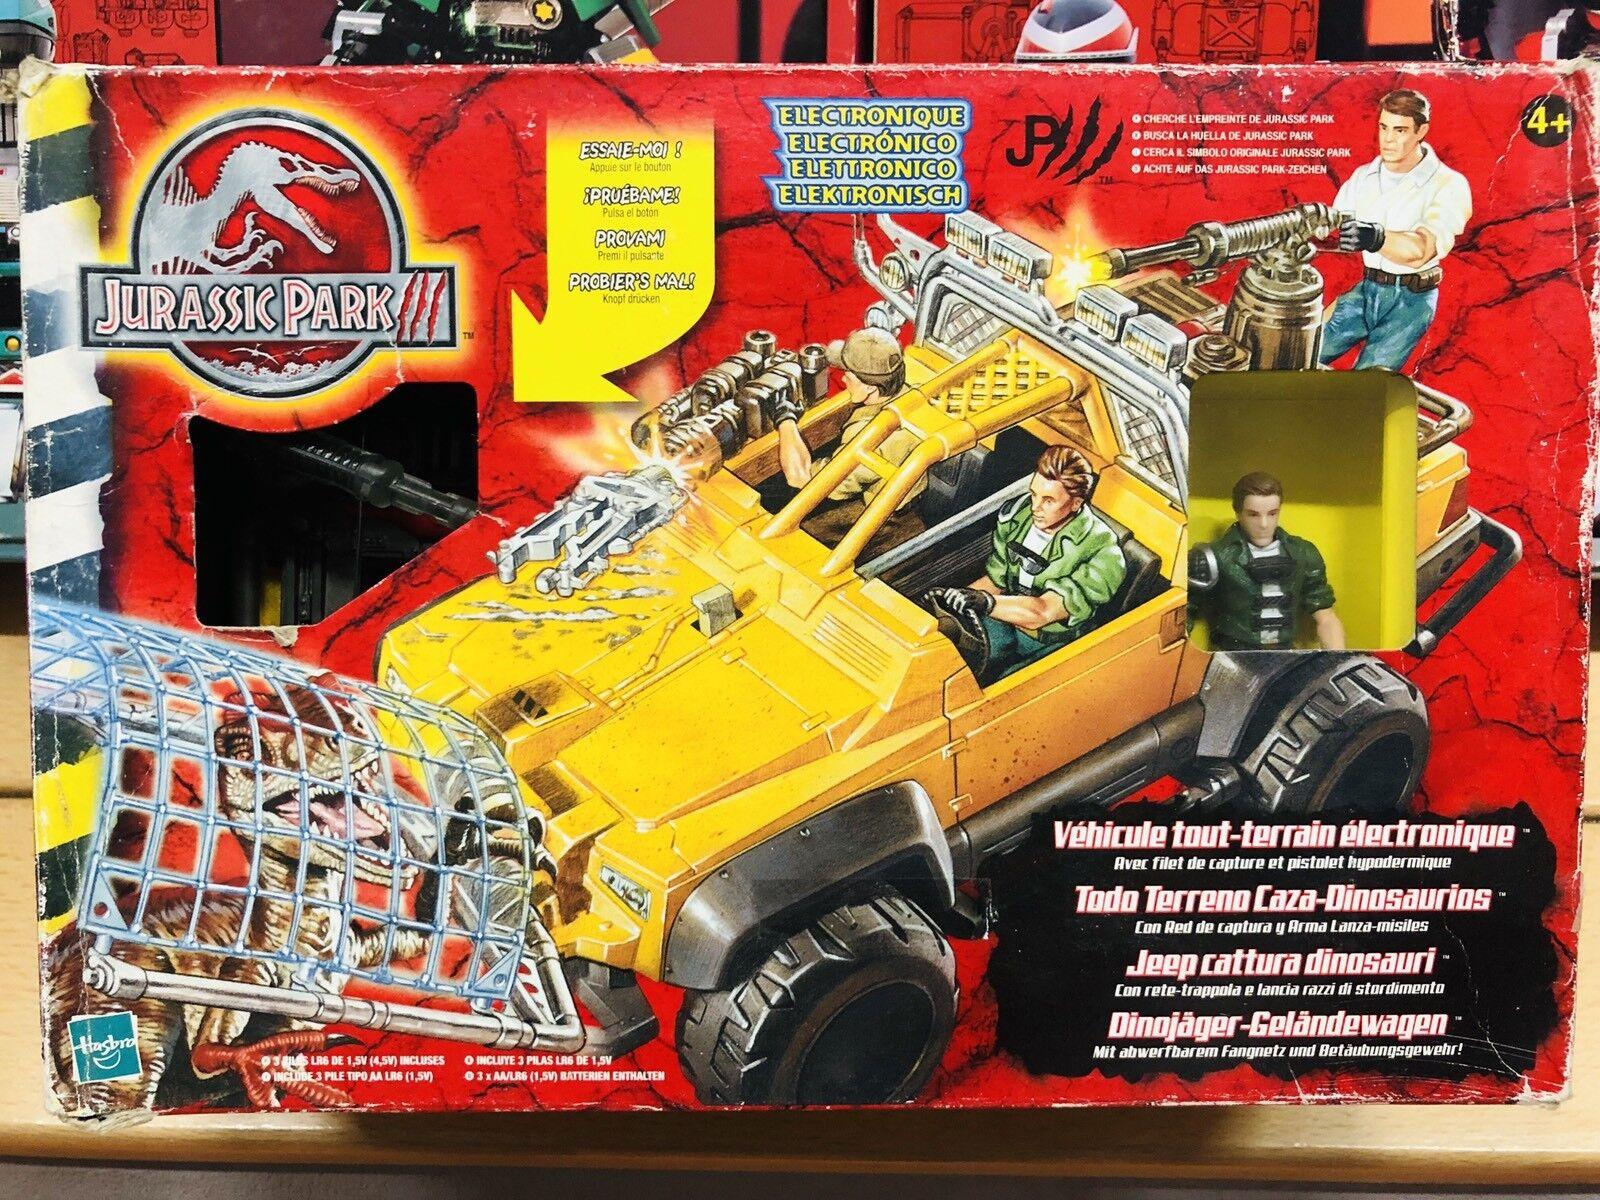 Jurassic park hasbro jeep cattura dinosauri neu